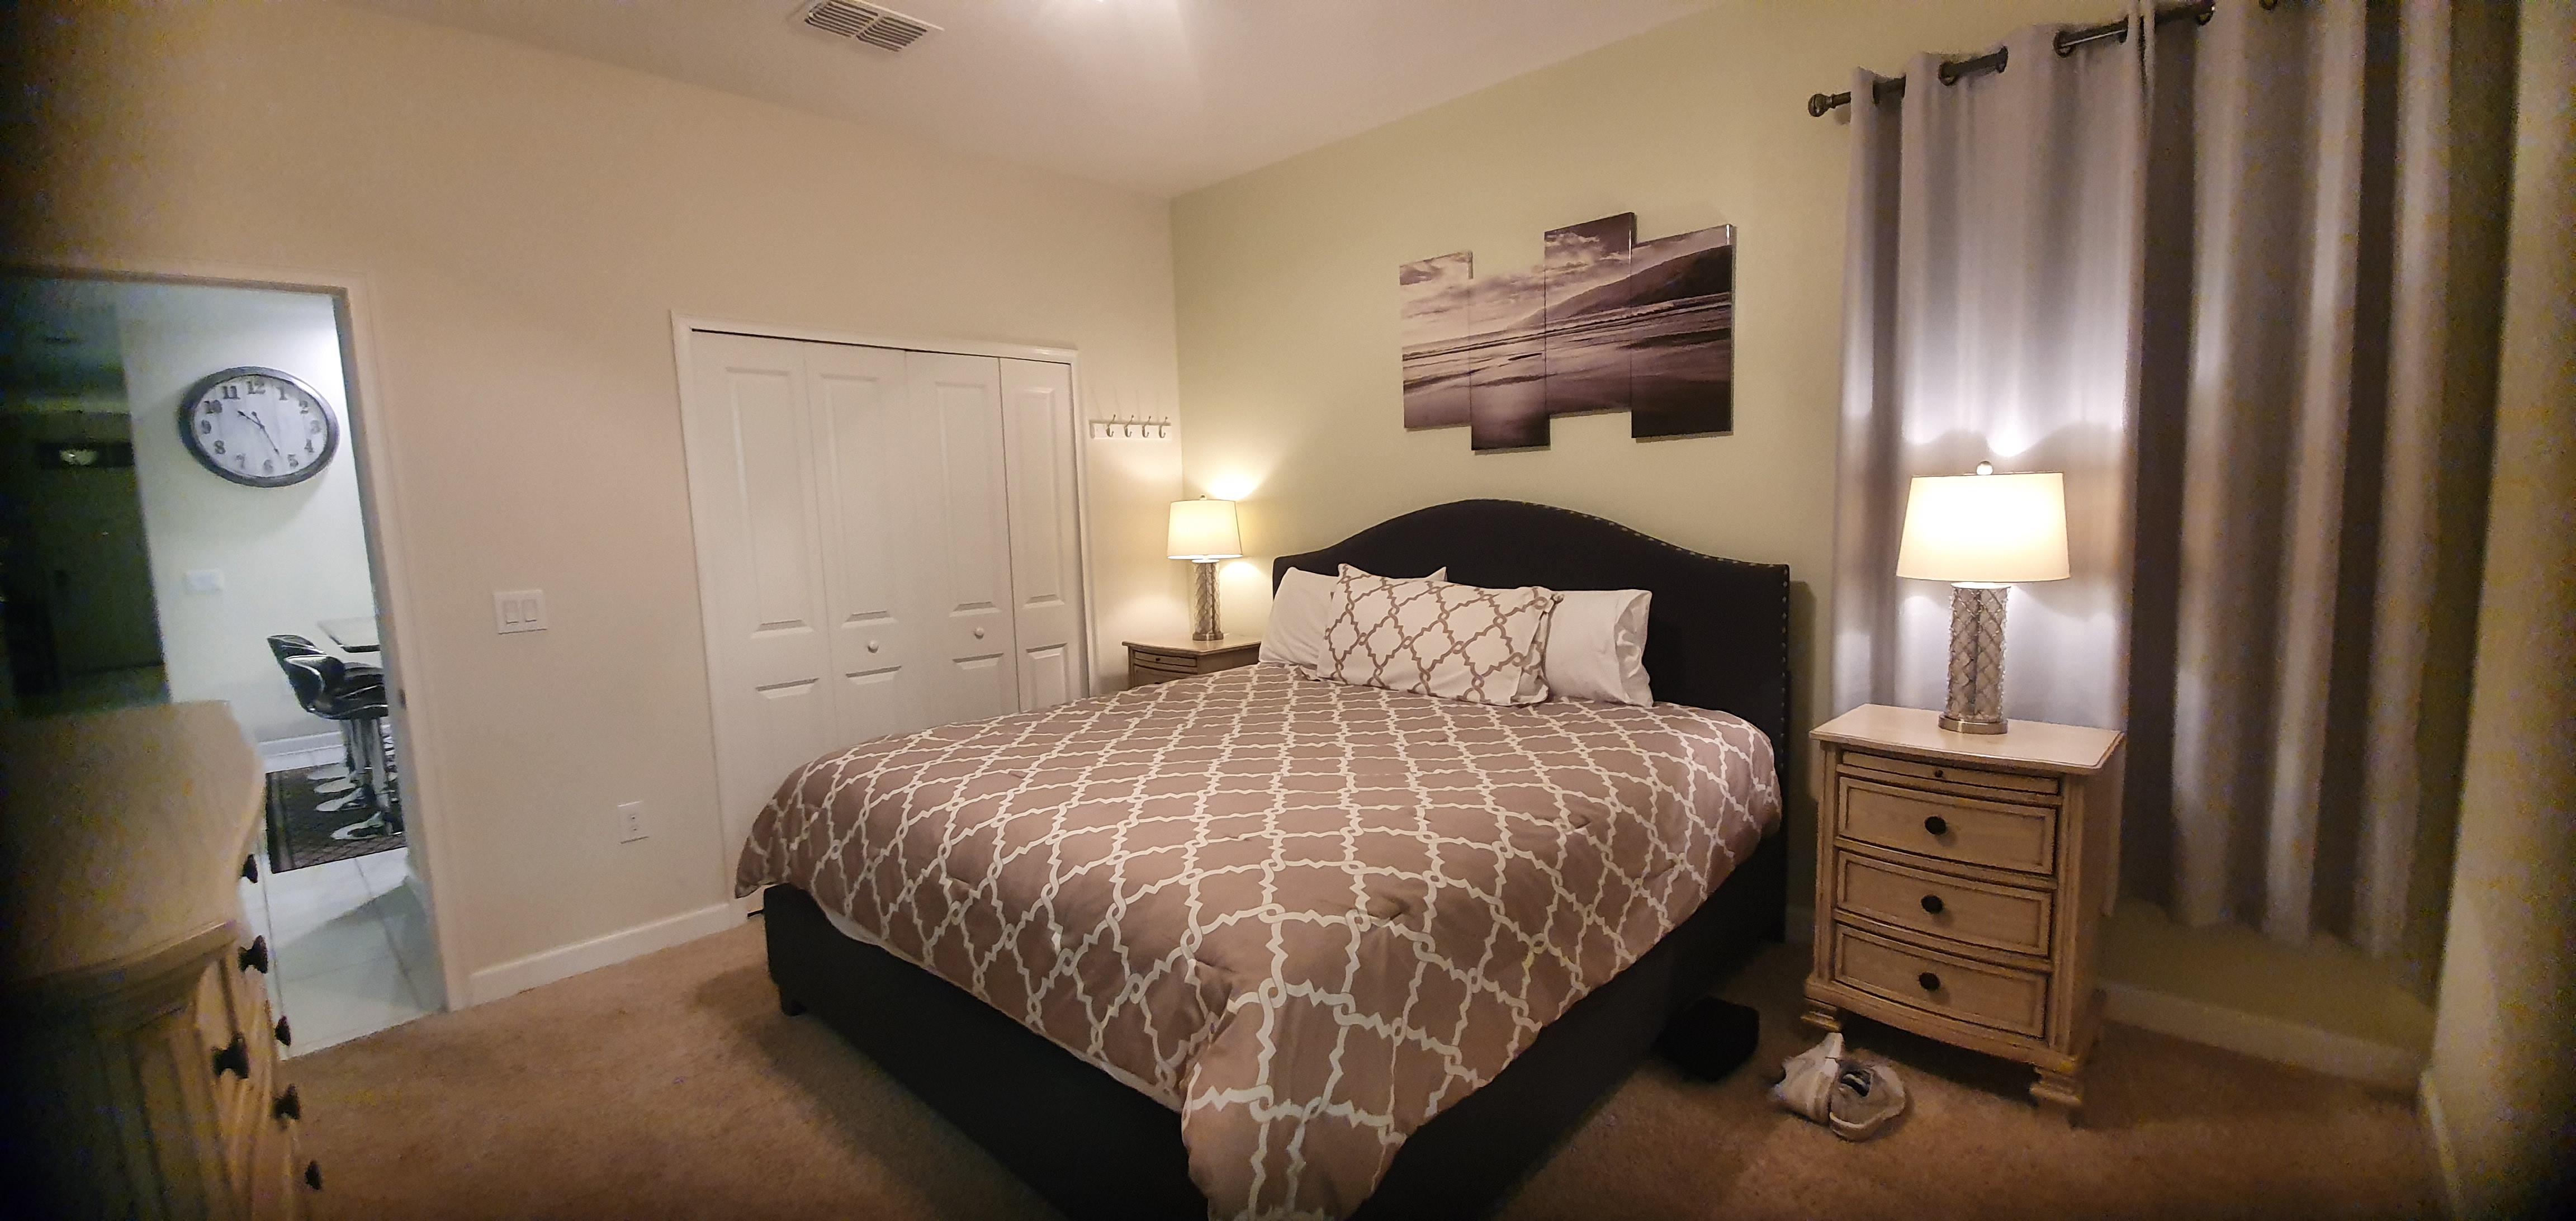 Apartment Villa  10 min from Disney  Golf  Wetpark all new photo 24719370